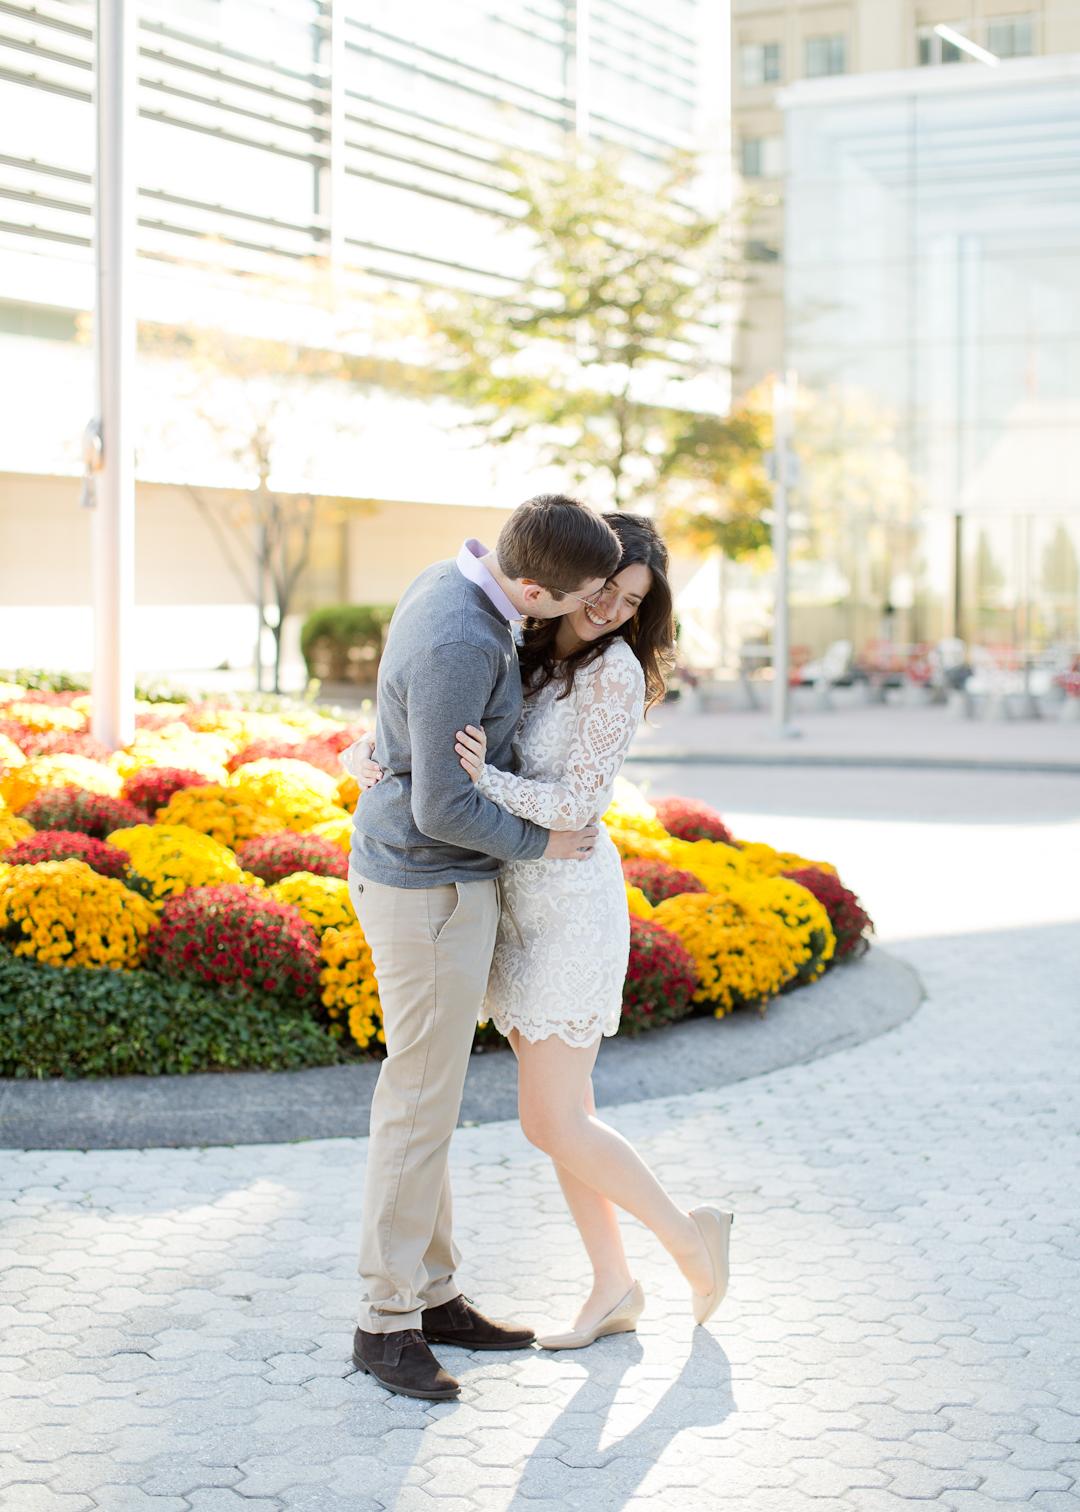 Melissa Kruse Photography - Christina & Alex Kips Bay Engagement Photos-32.jpg